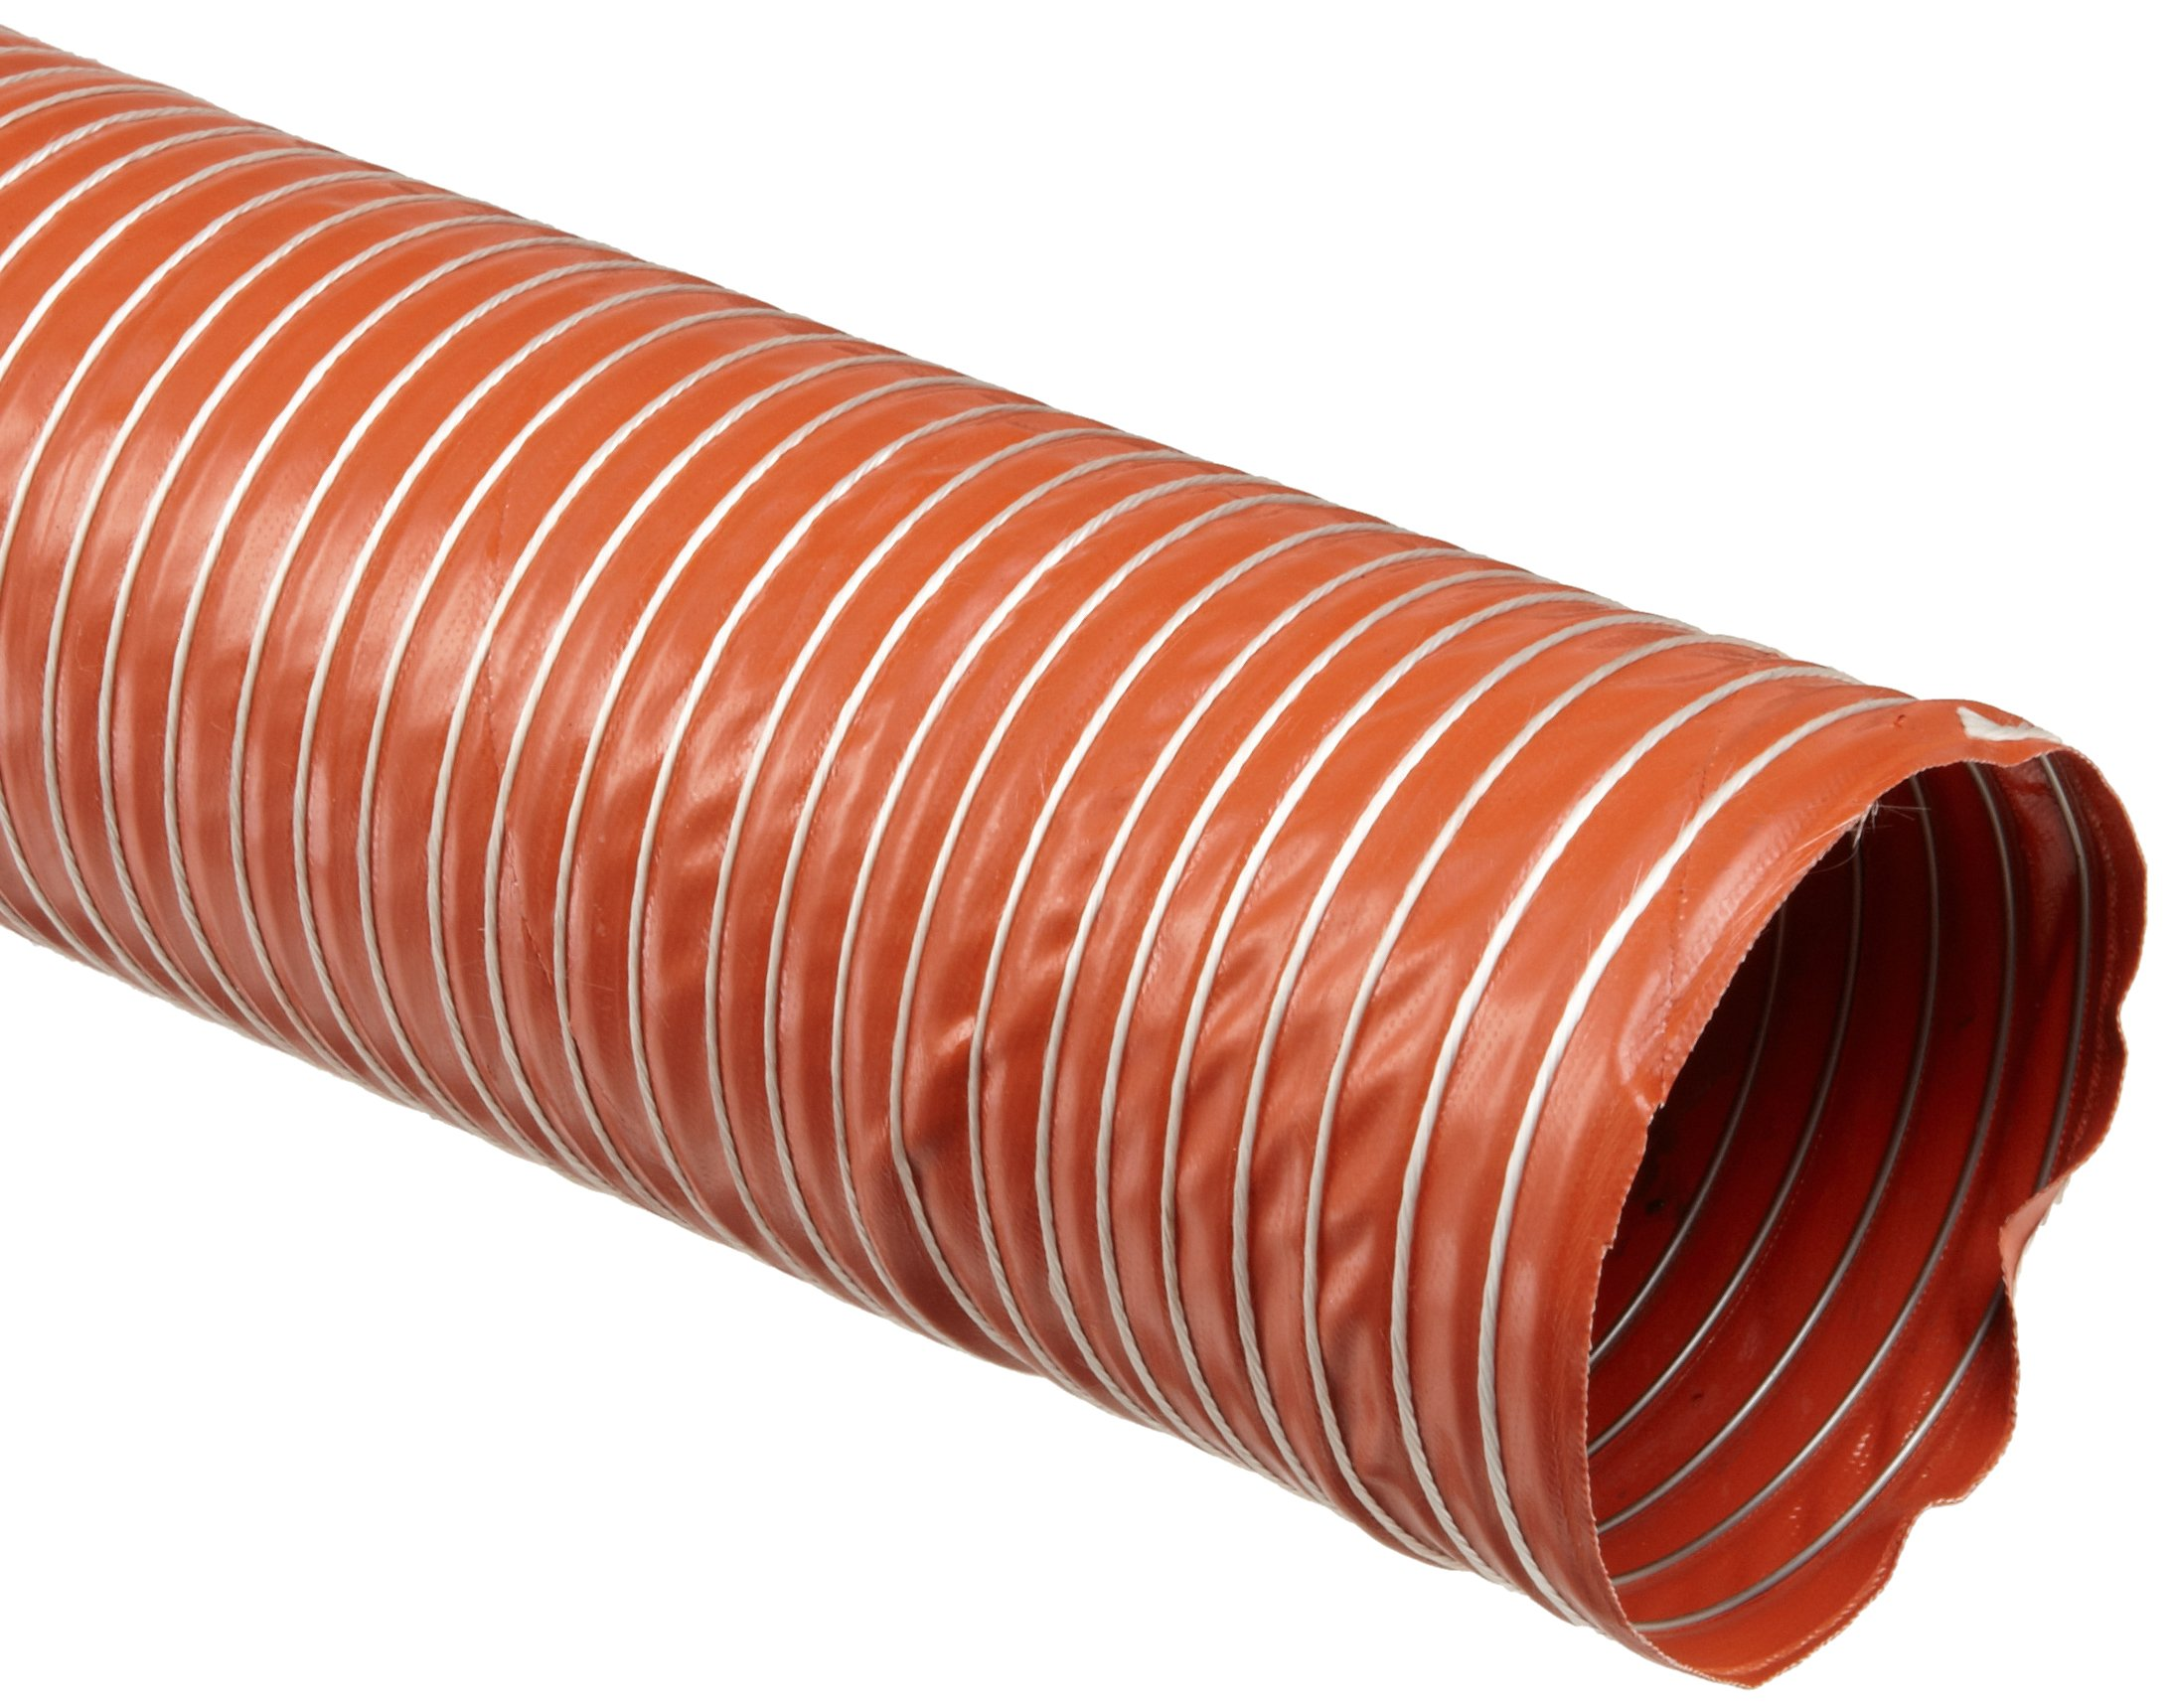 Heat-Flex BDS Fiberglass Duct Hose, Iron Oxide Red, 10'' ID, 12' Length by Flexaust (Image #1)